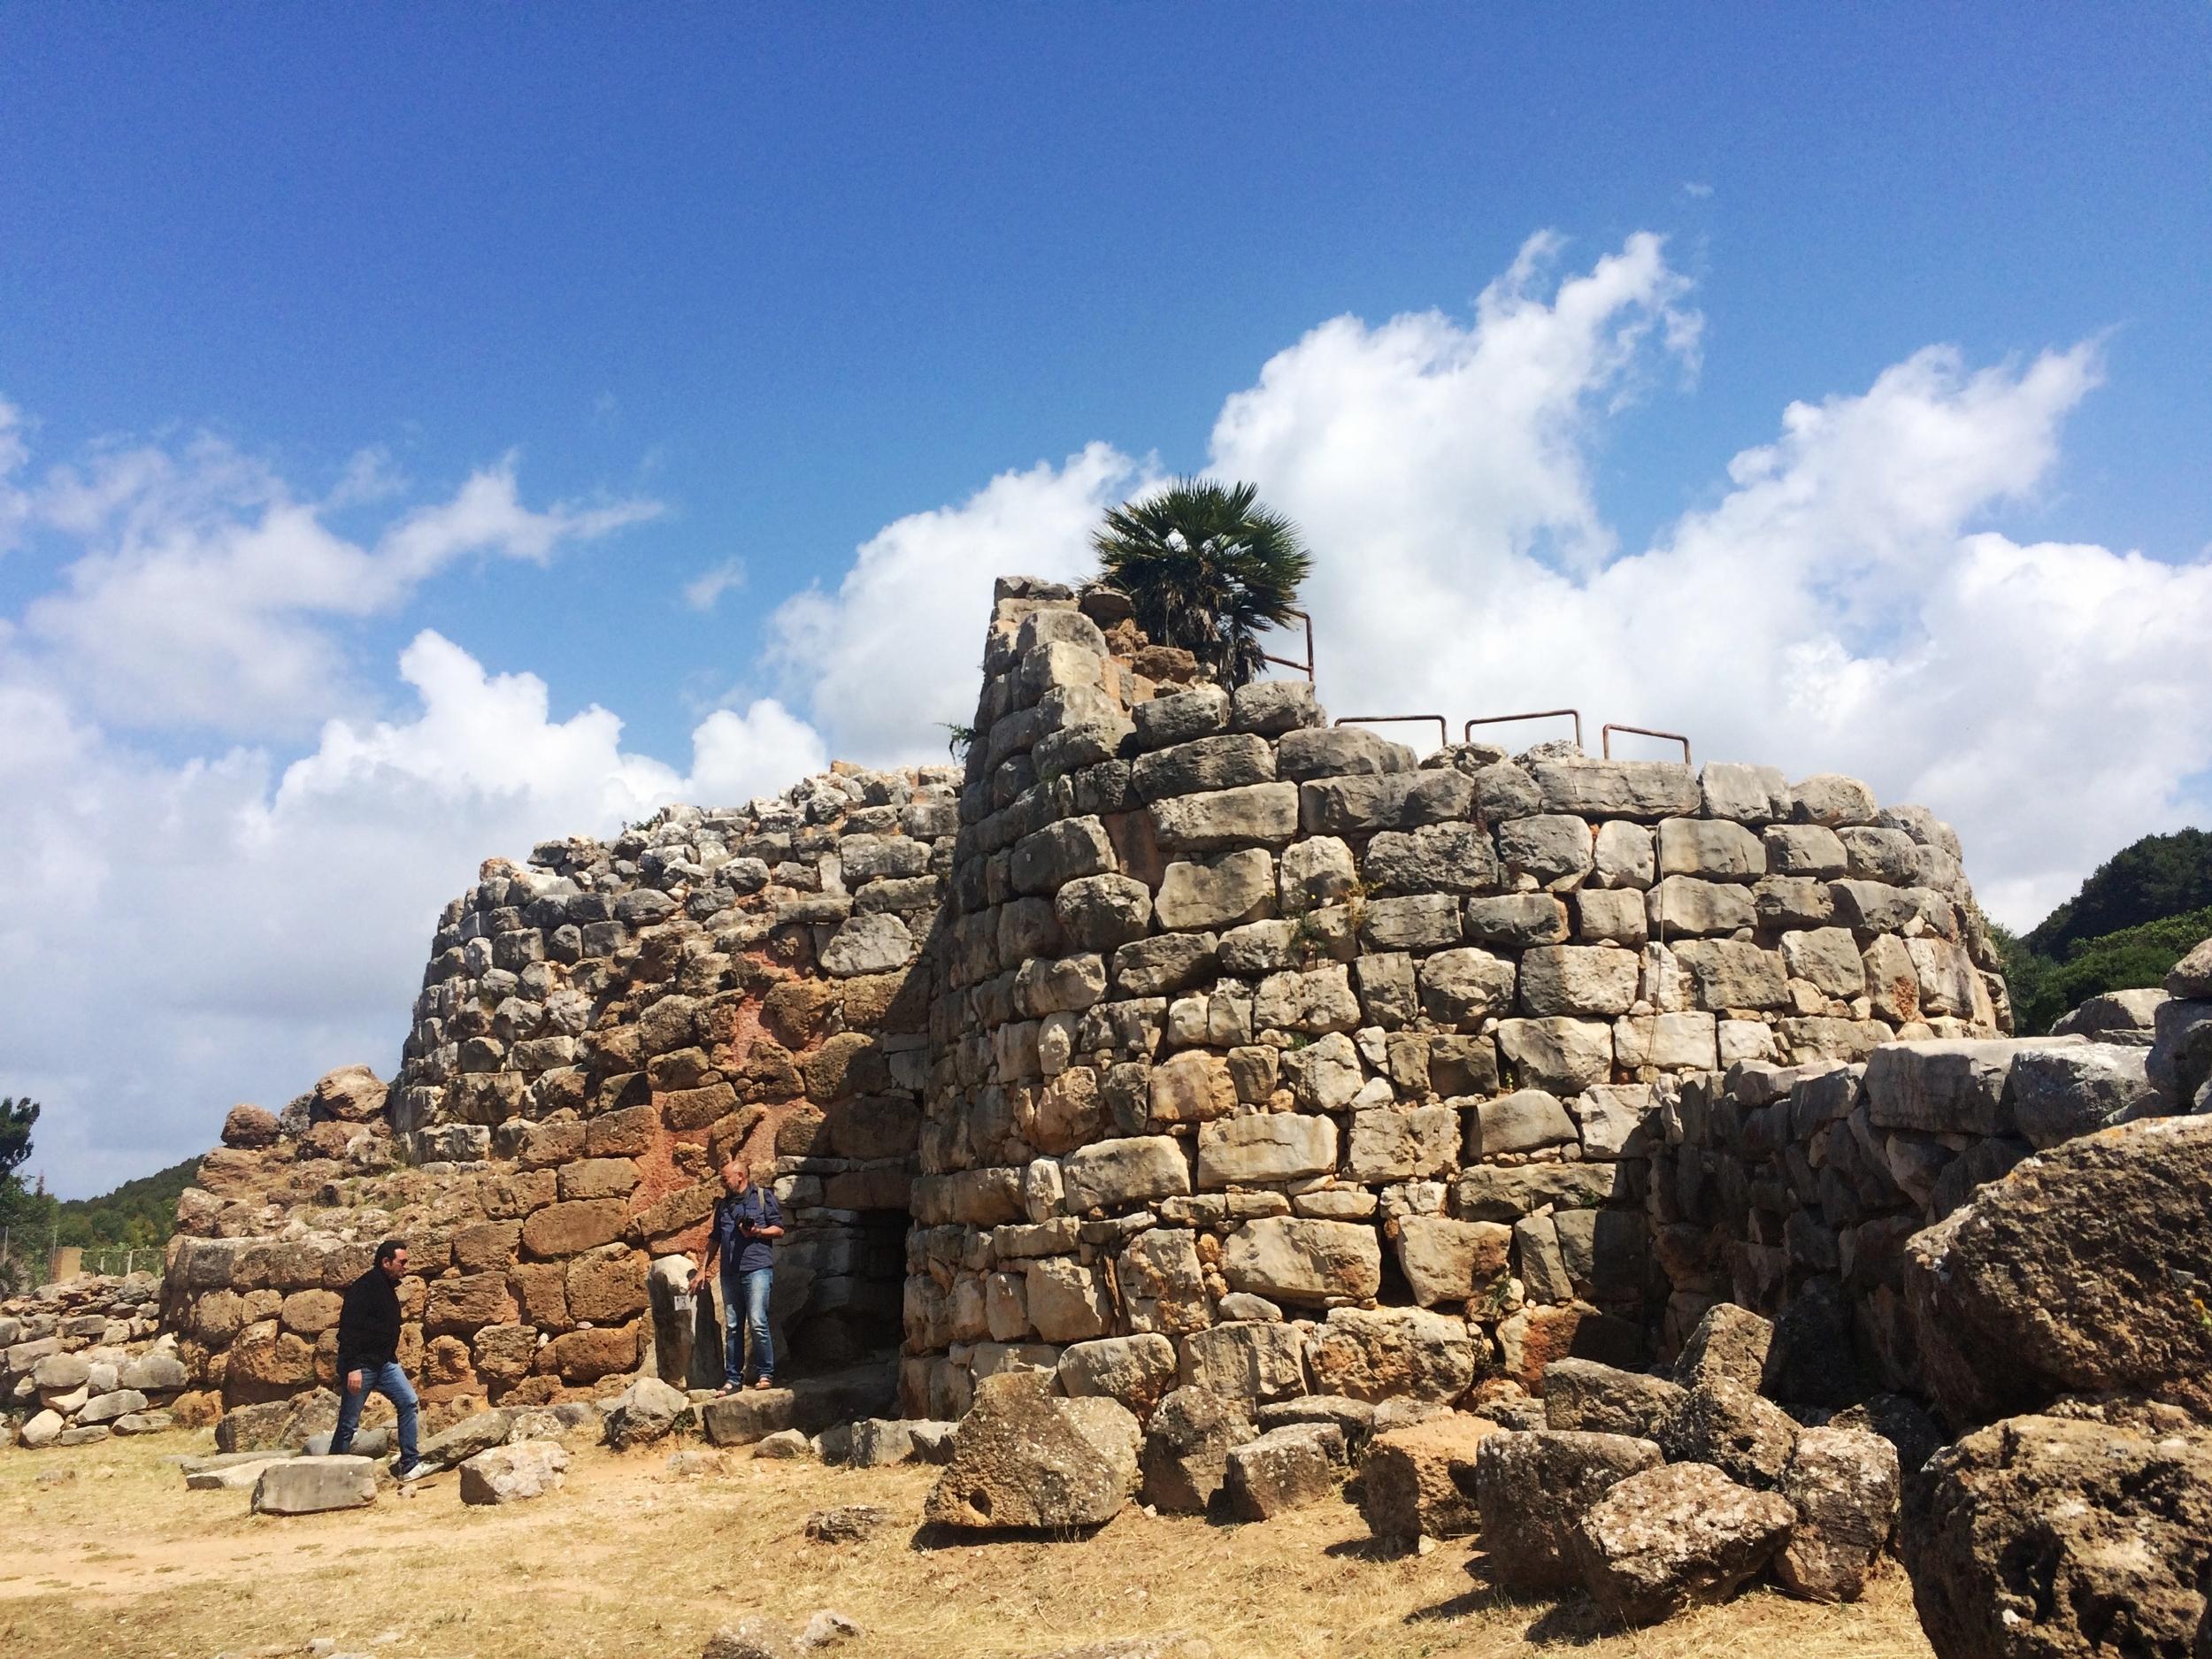 Archeology site in Sardinia